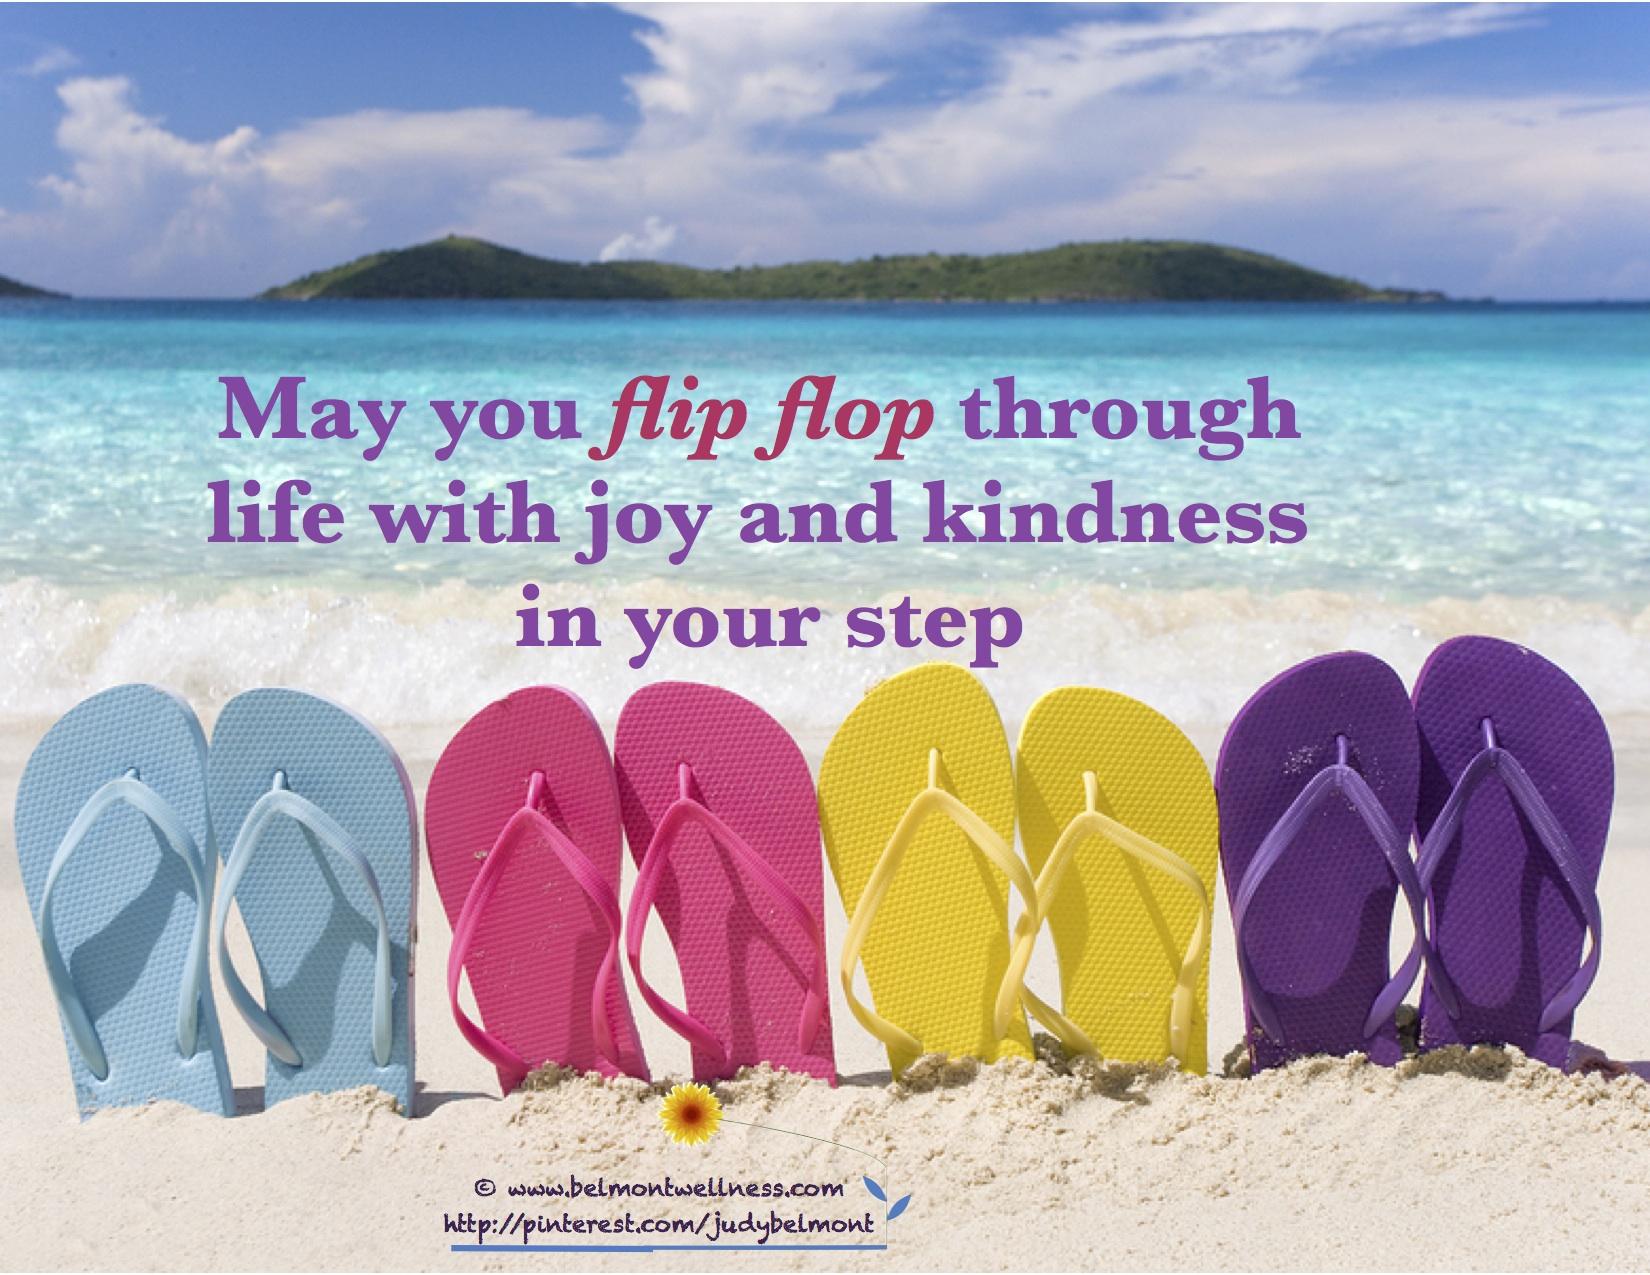 Summer Flip Flop Quotes Image 01